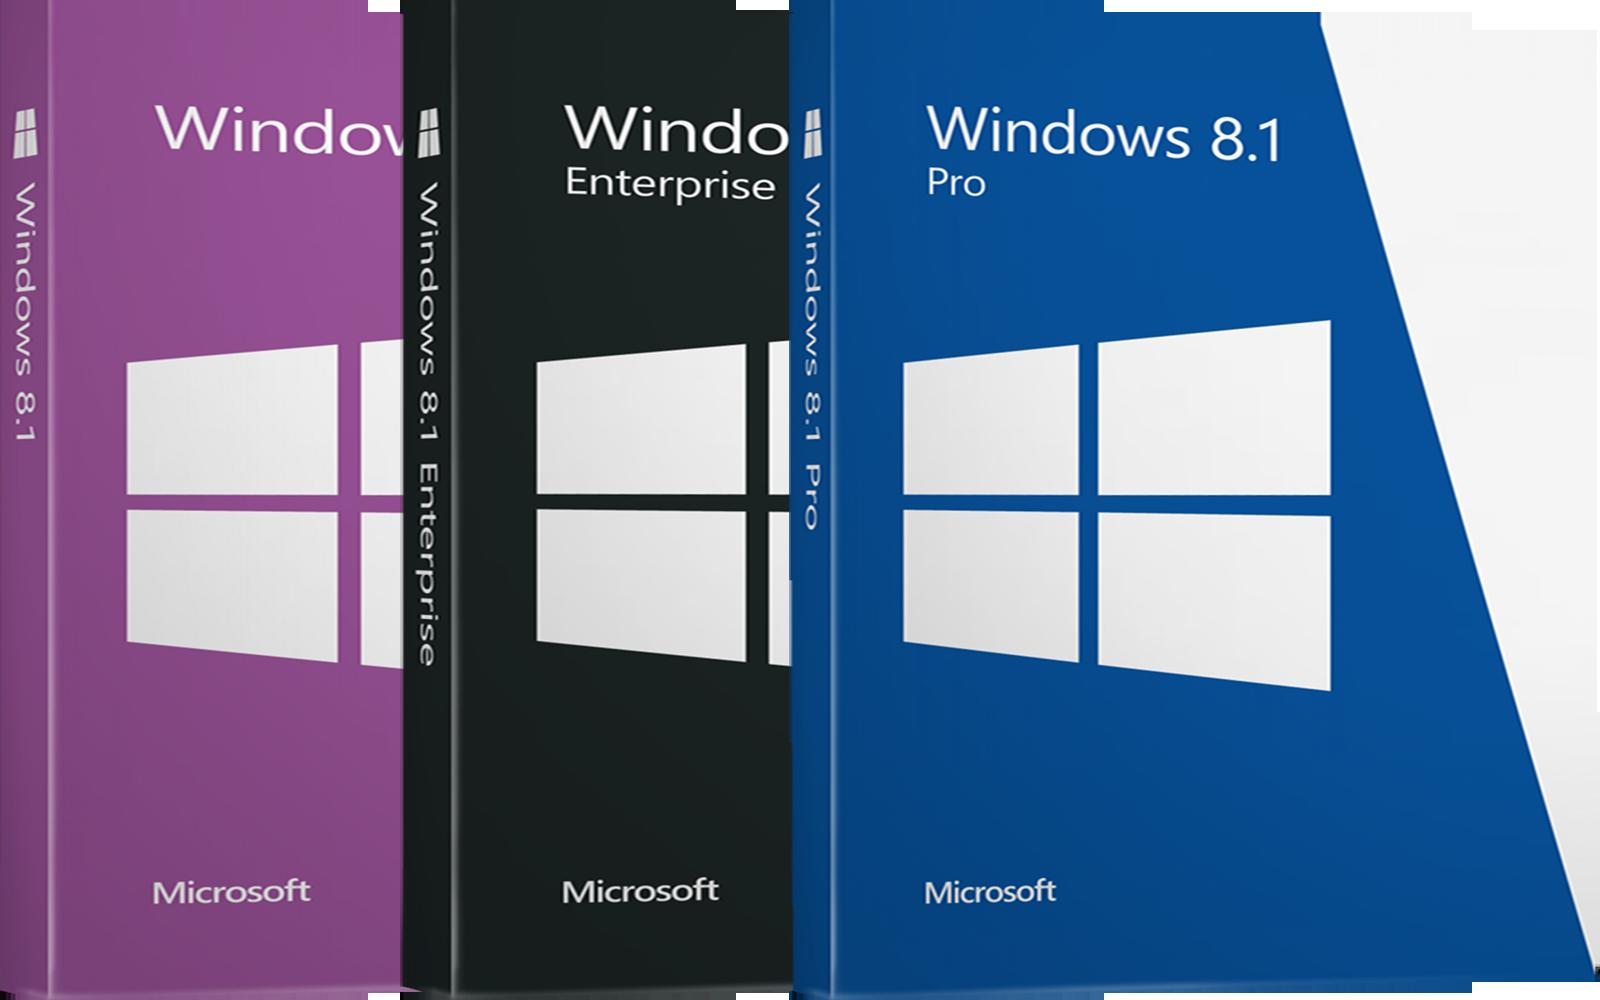 windows 8.1 pro retail download